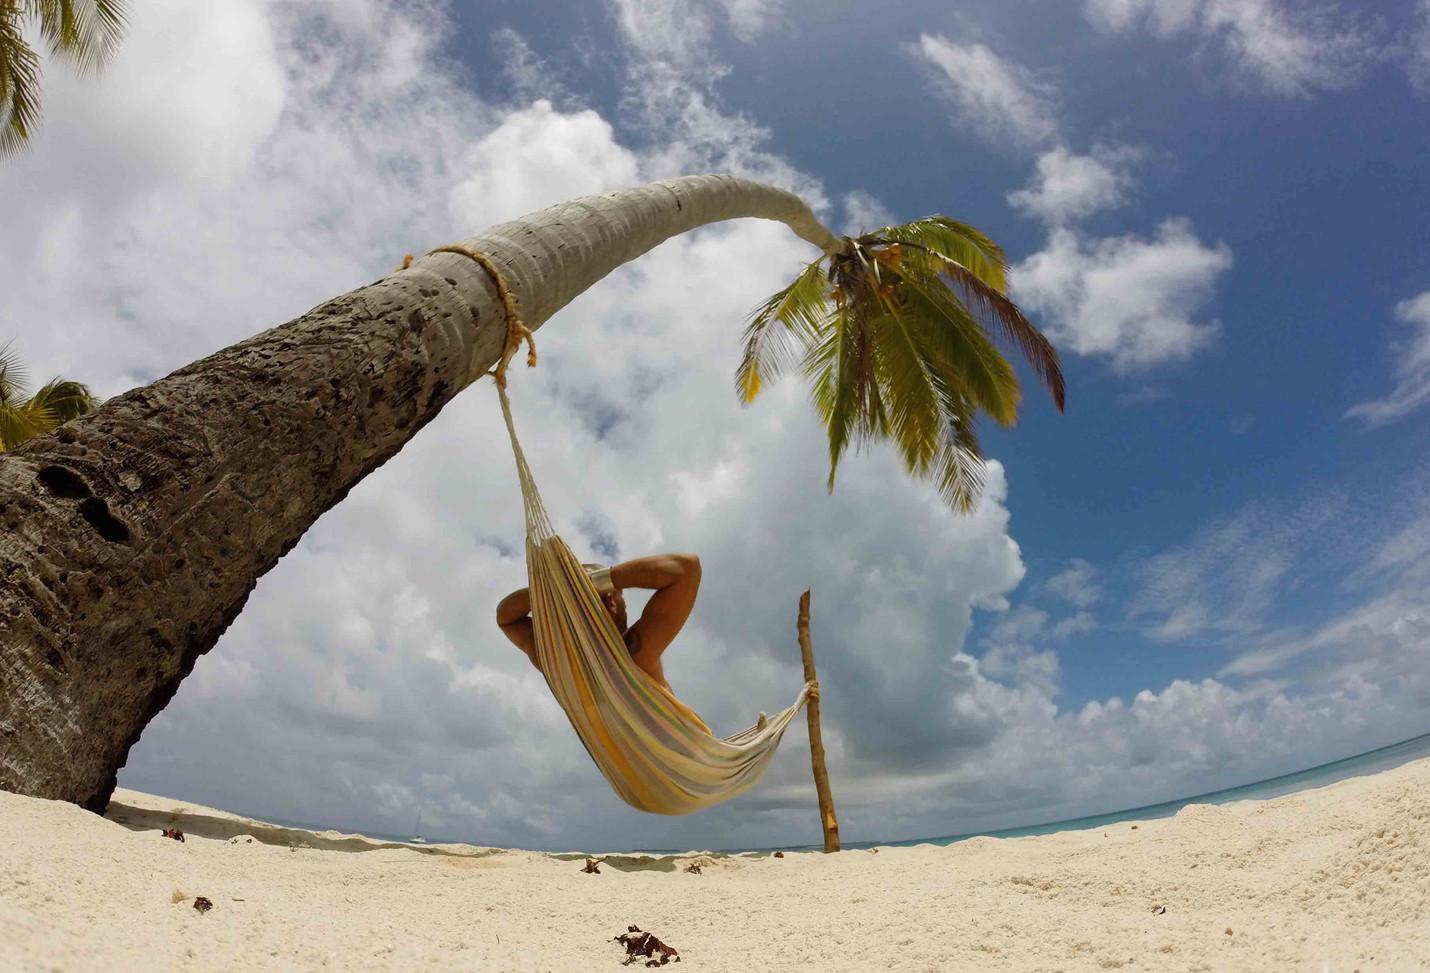 Tanzania - Fanjove Island - Beach relax